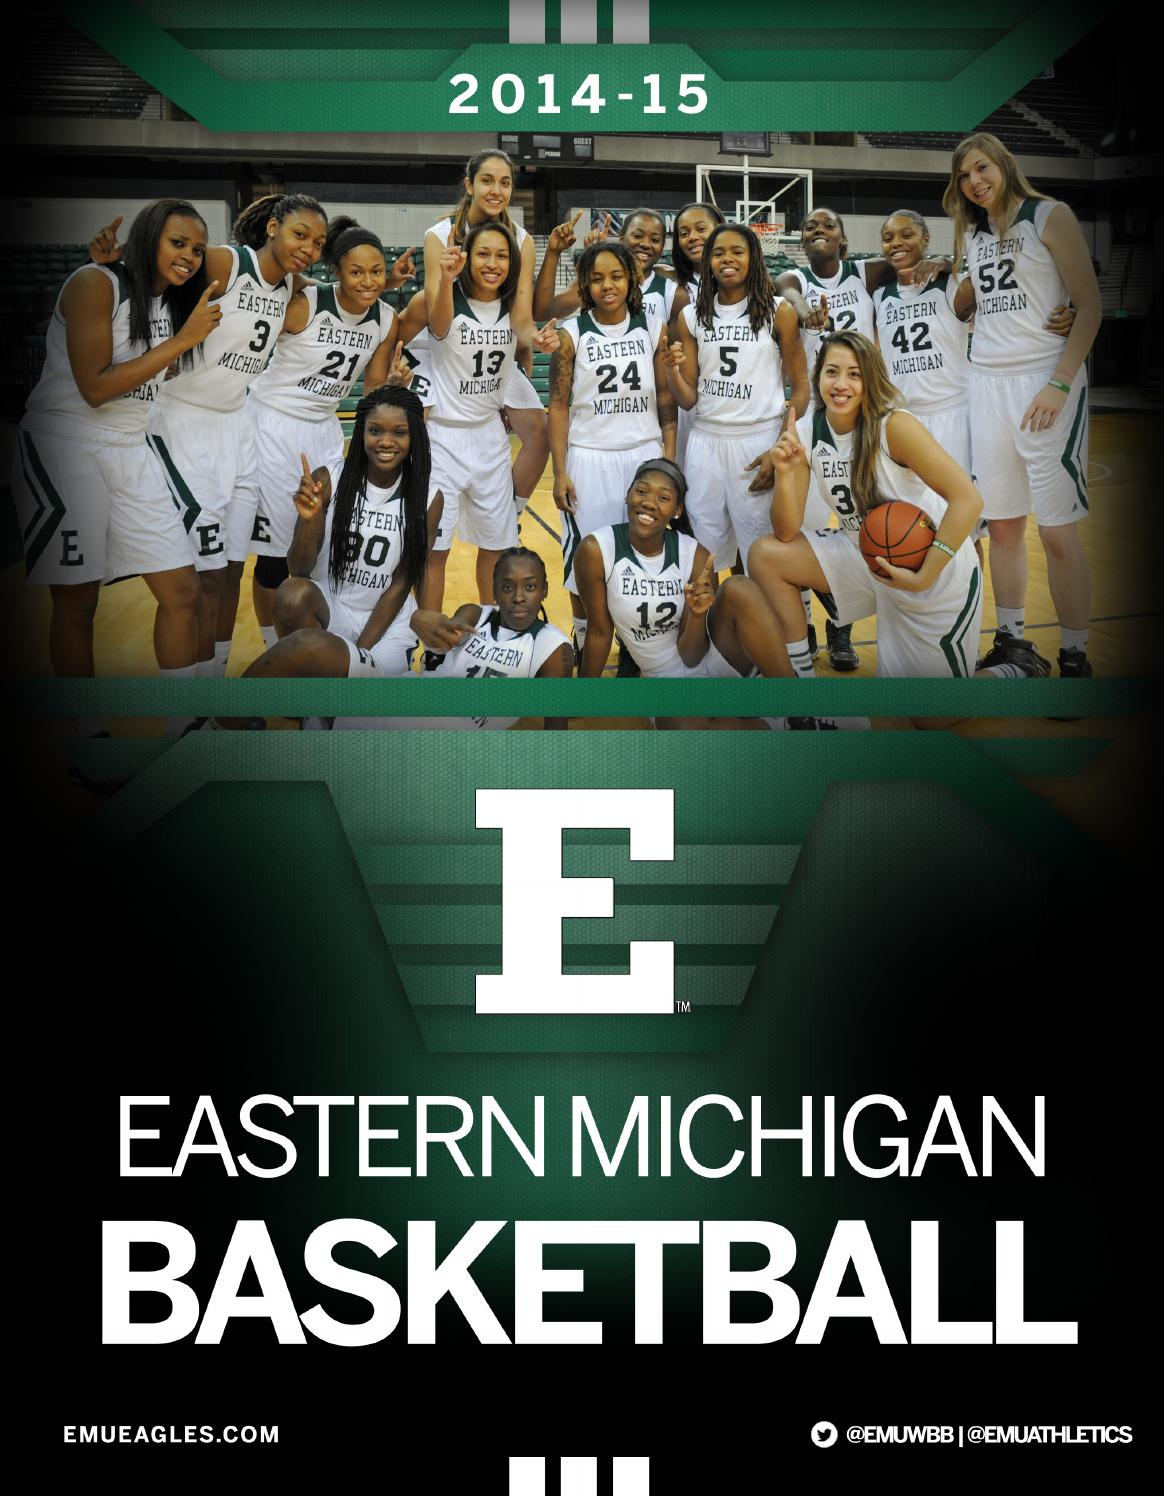 2014-15 EMU Women's Basketball Guide by Eastern Michigan